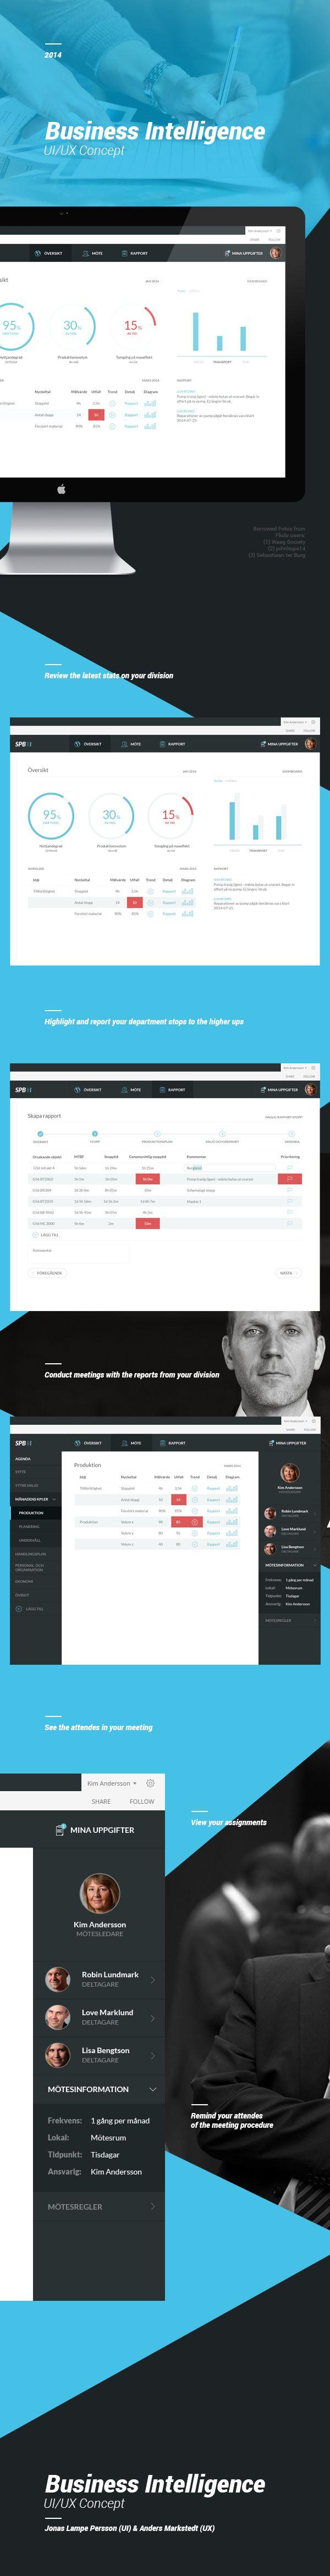 Business Intelligence UI - Dashboard on Behance